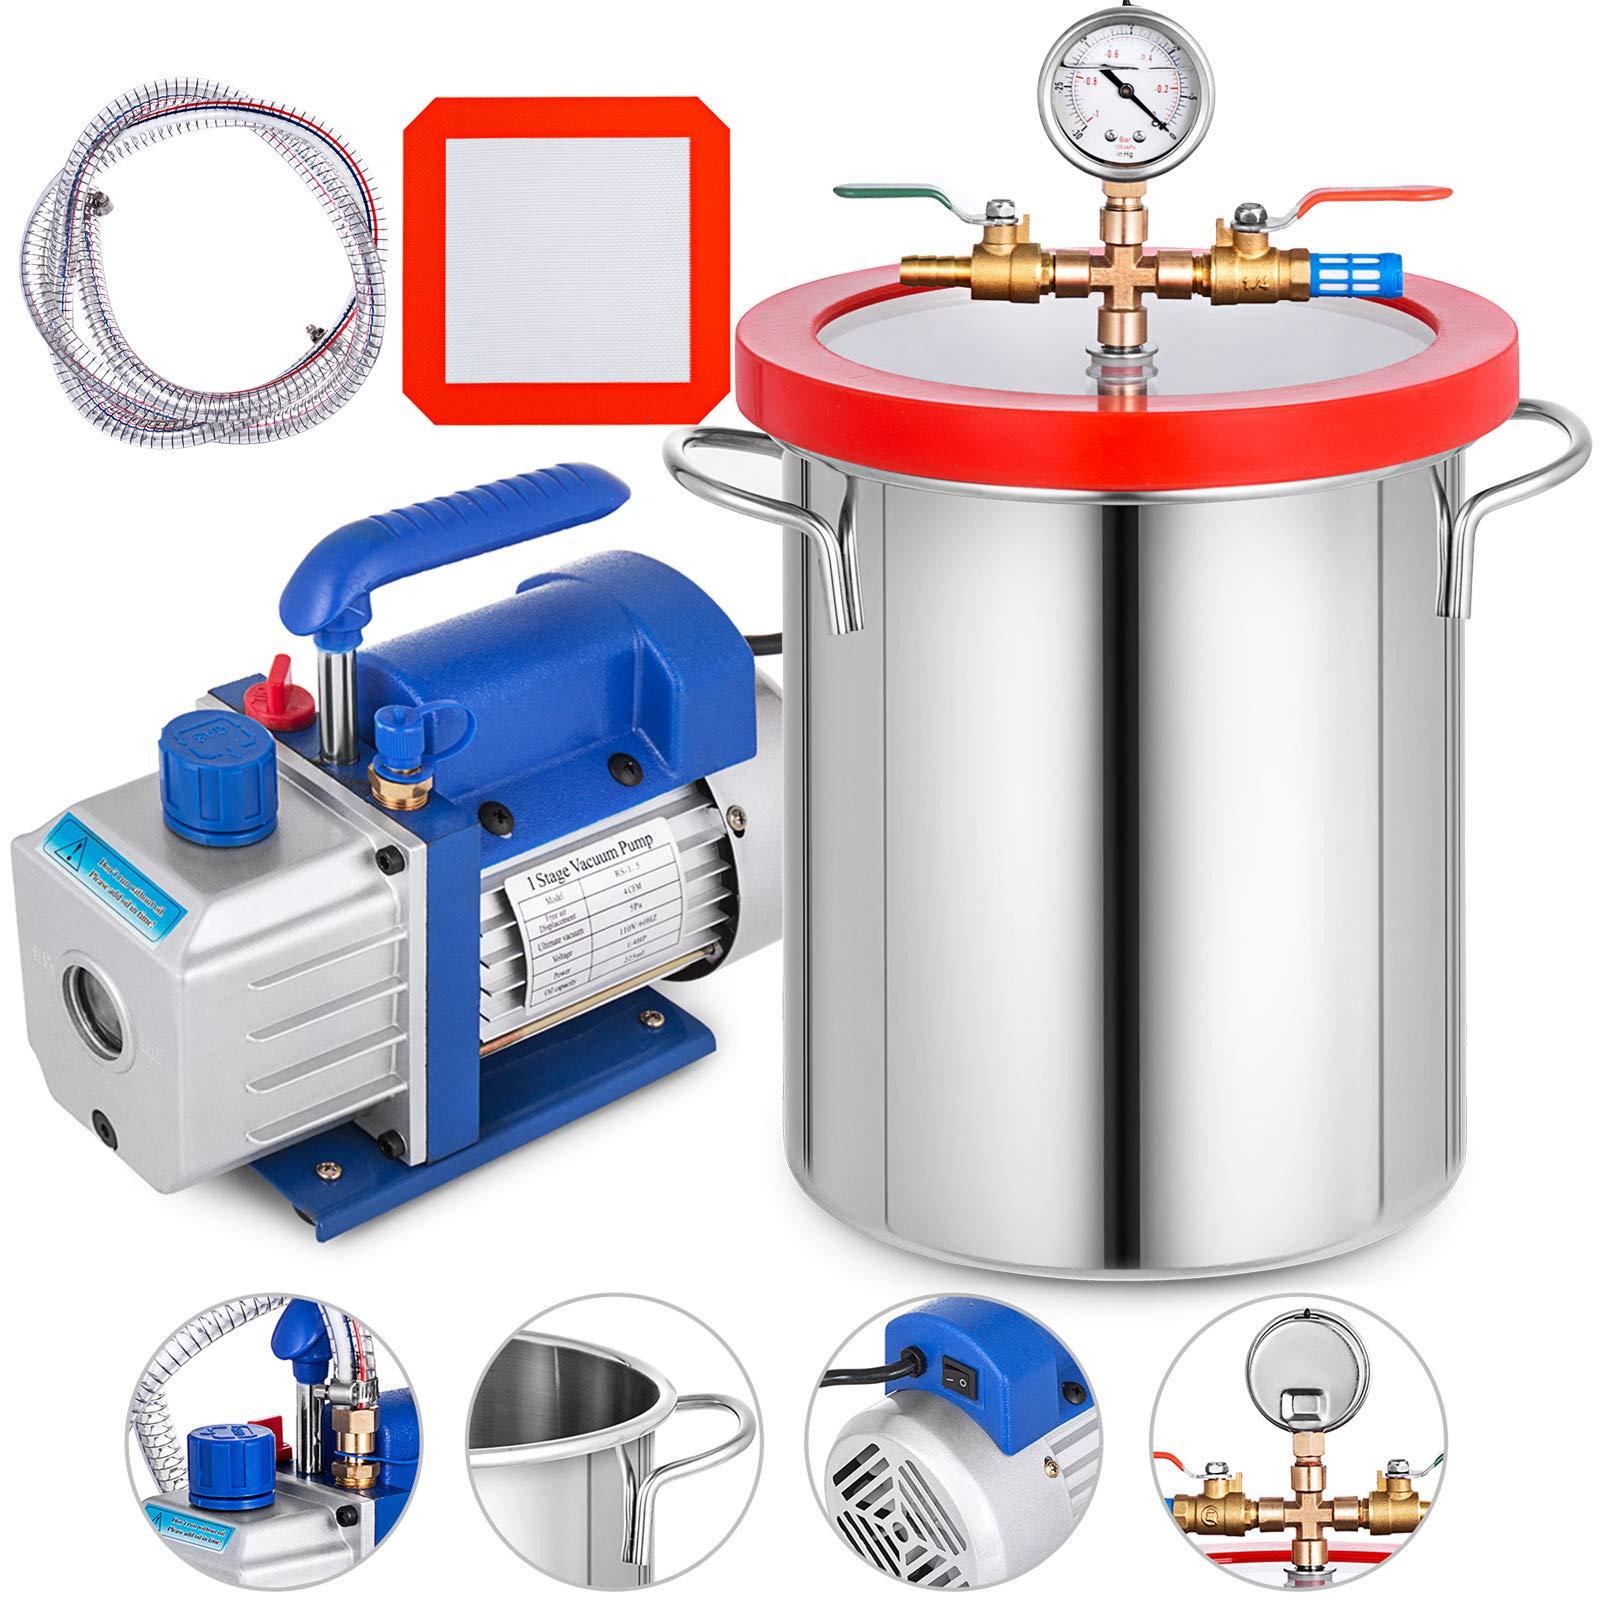 Bestauto Stainless Steel Vacuum Pump 3 Gallon Degassing Chamber Kit 3CFM Vacuum Pump (3 Gallon 3 CFM) by Bestauto